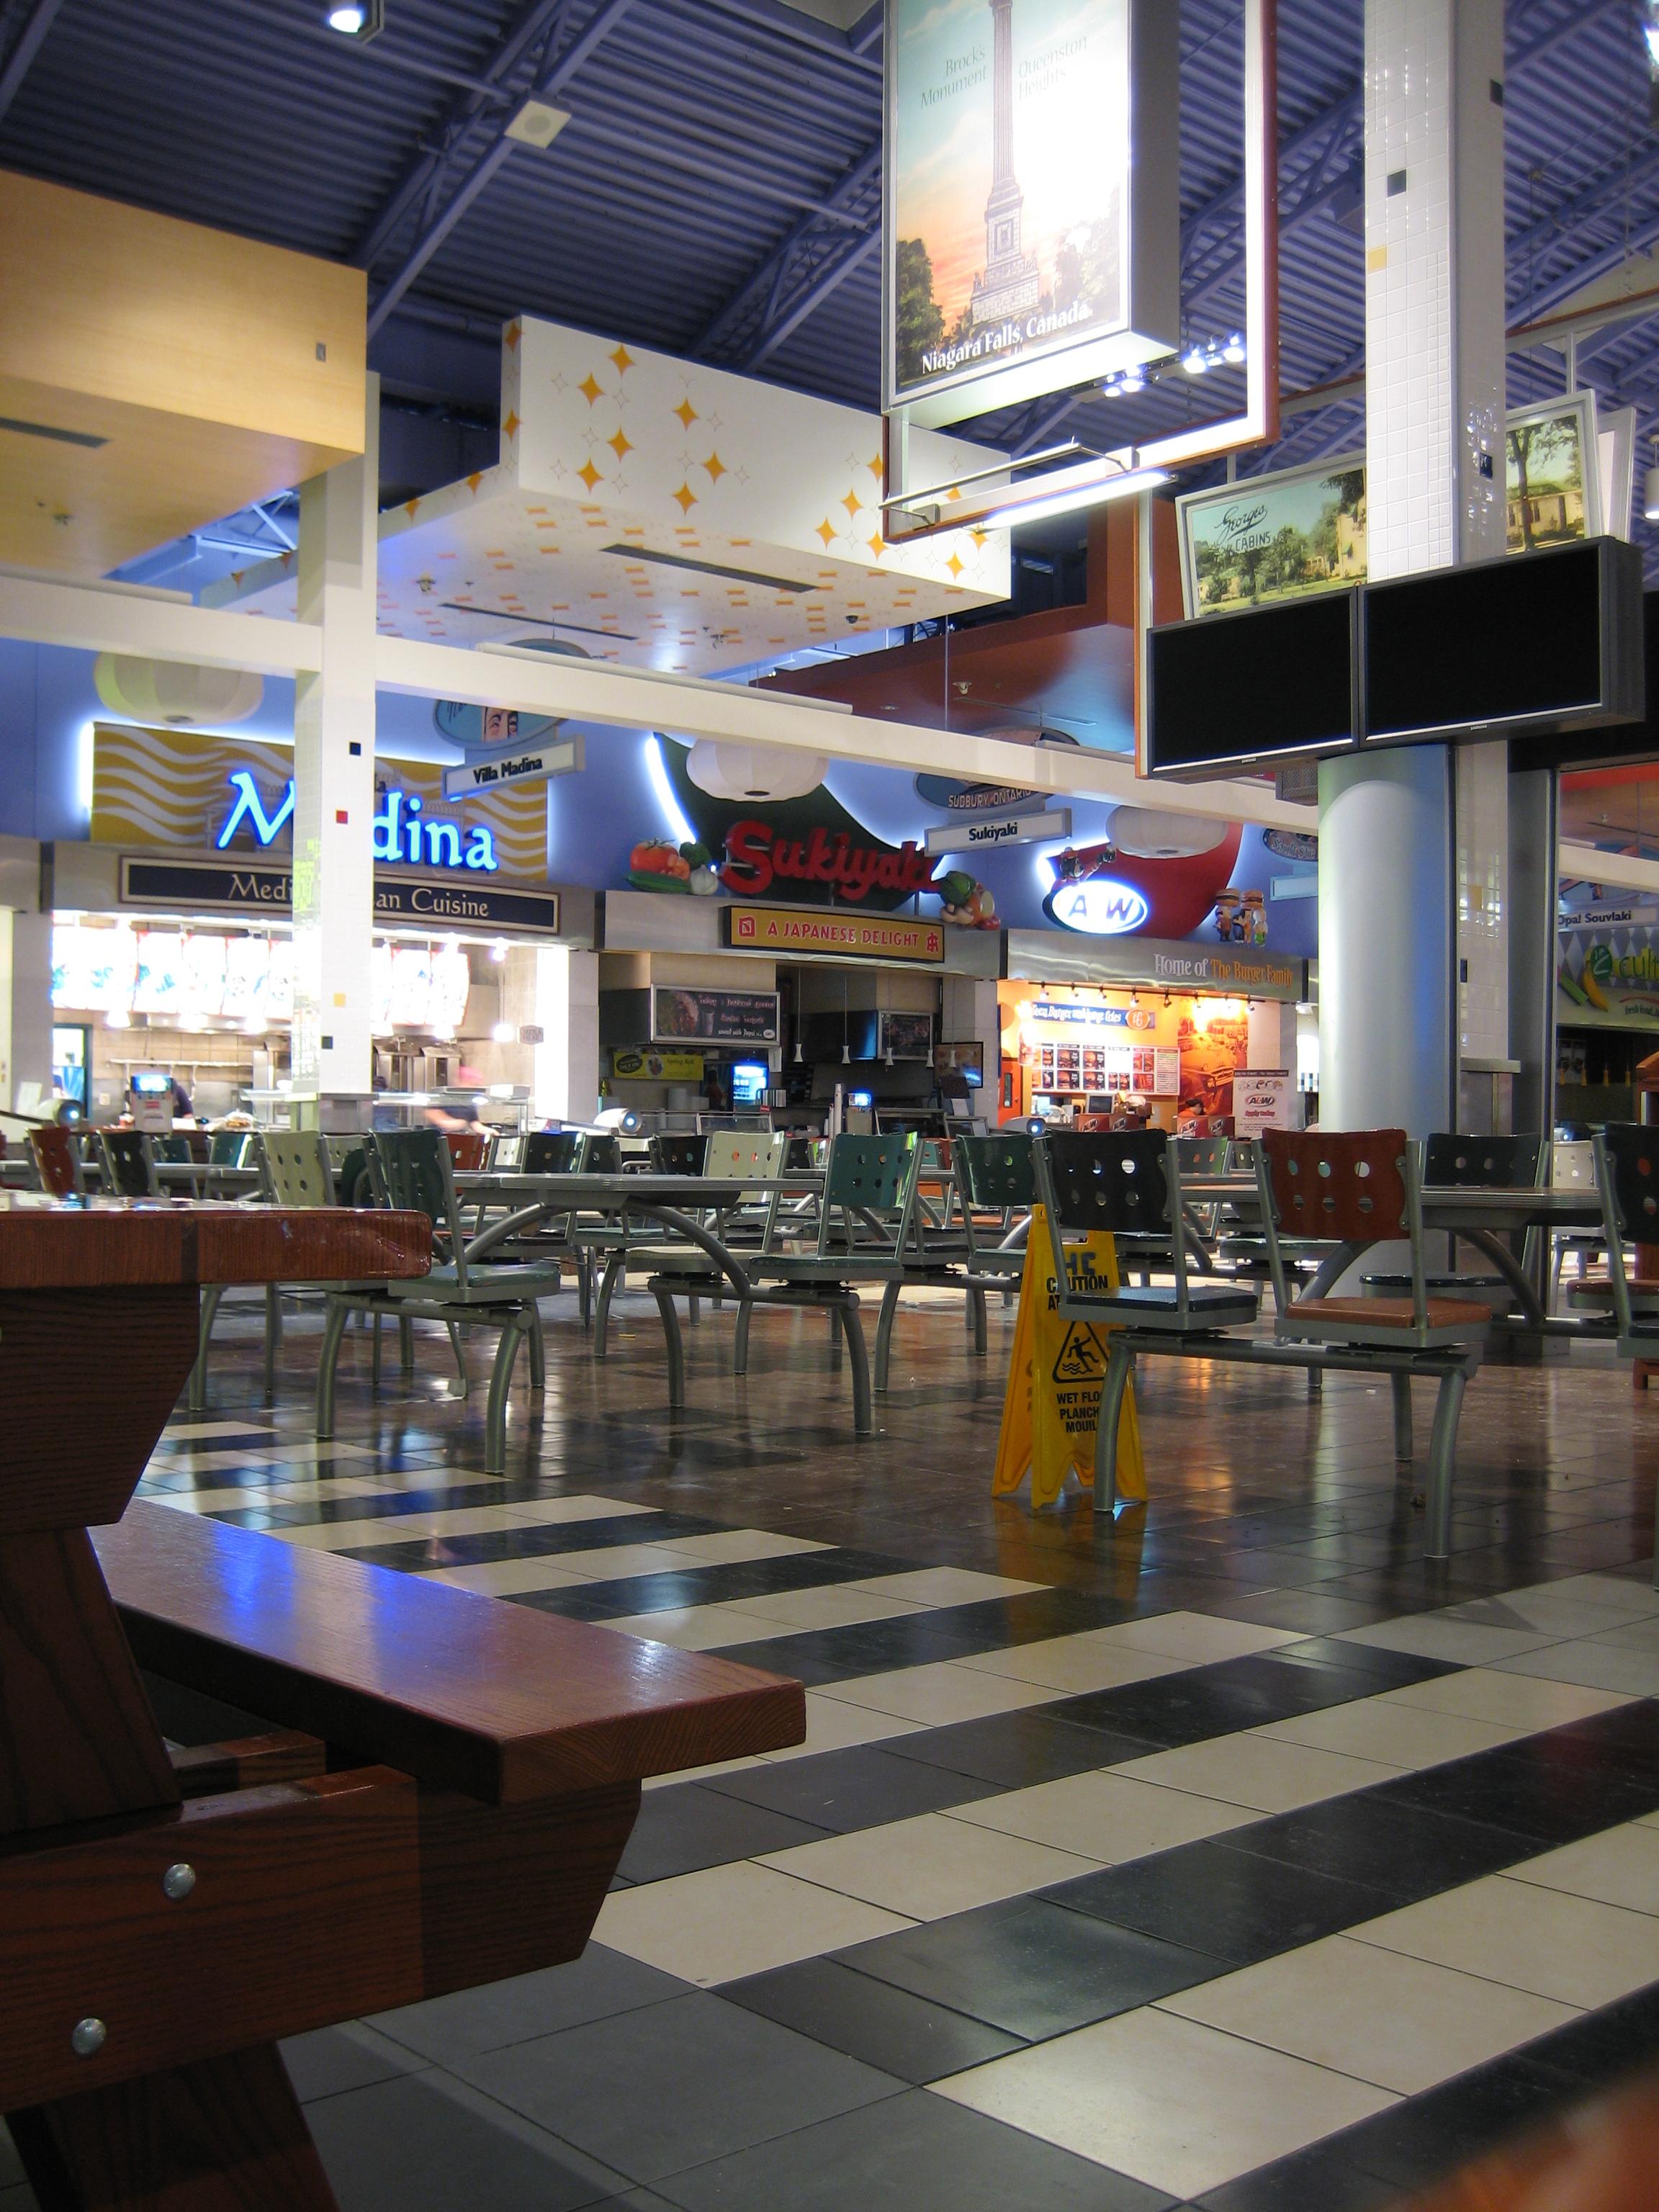 Food Court Nd Grover Omaha